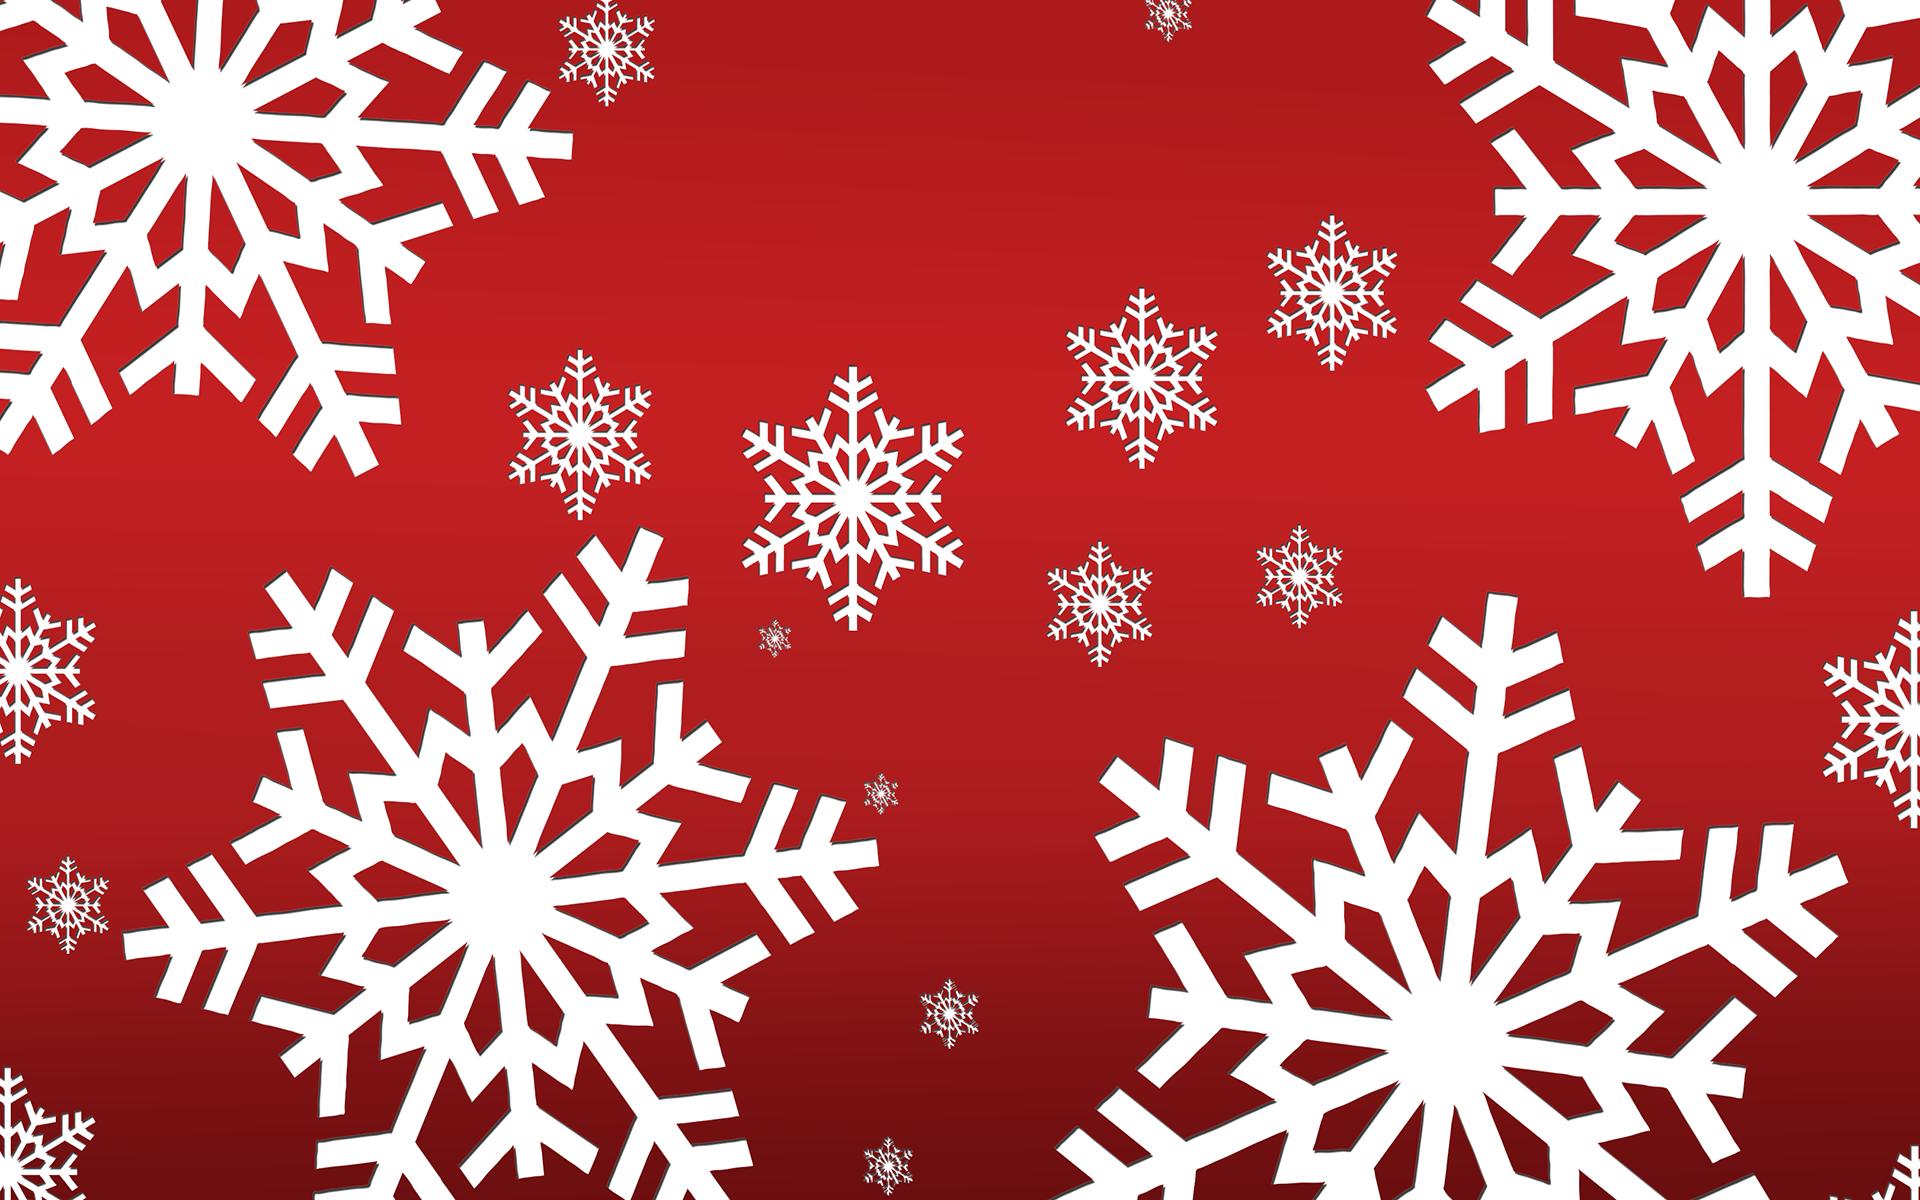 Снежинки на картинку, медицинского работника открытка